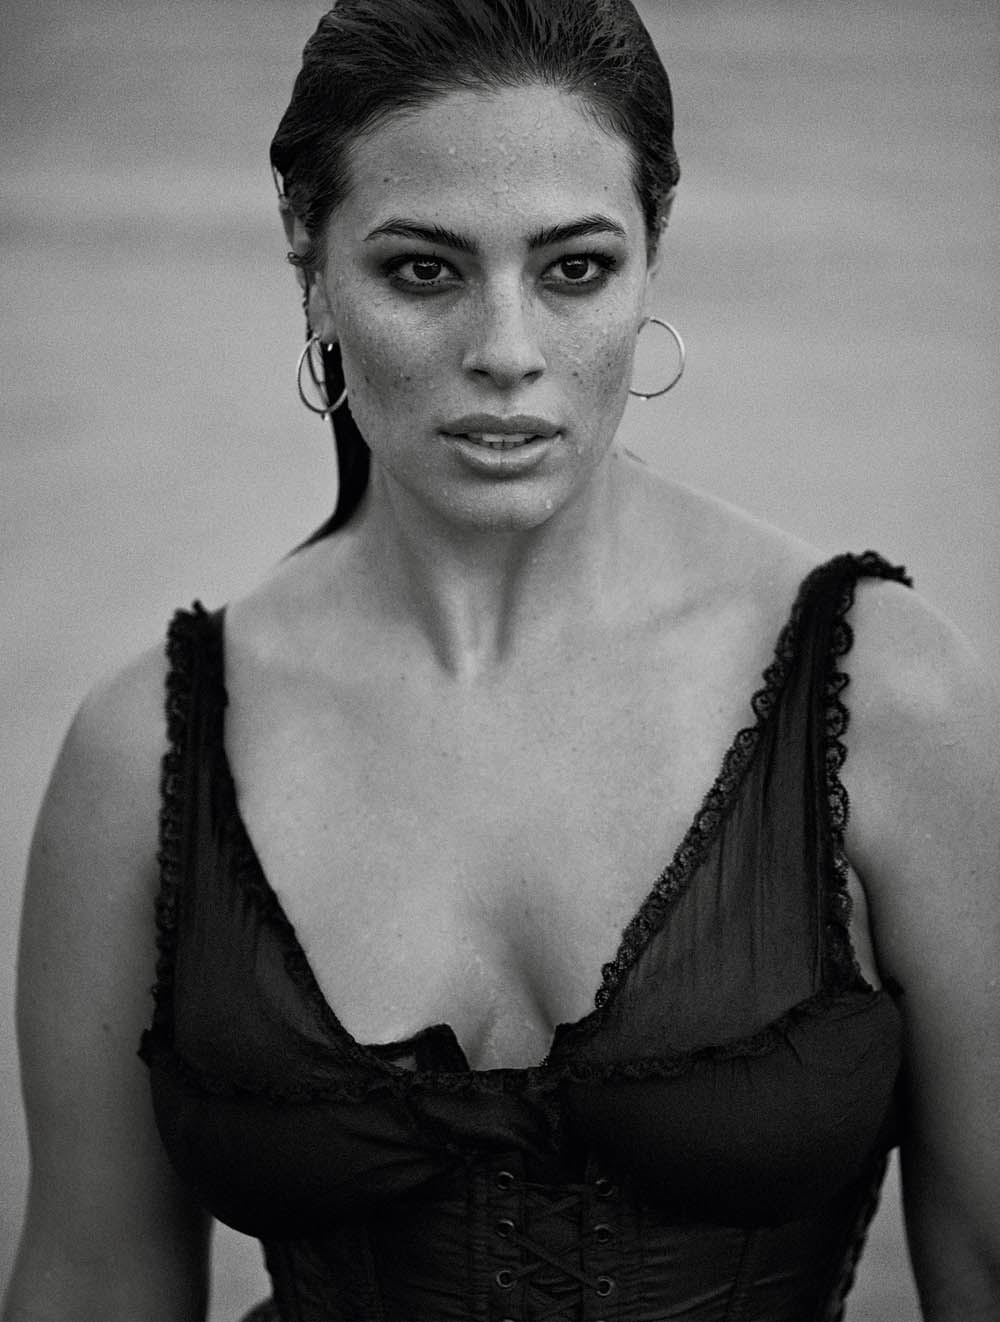 Ashley-Graham-by-Lachlan-Bailey-for-Vogue-Paris-November-2018-5 (1).jpg